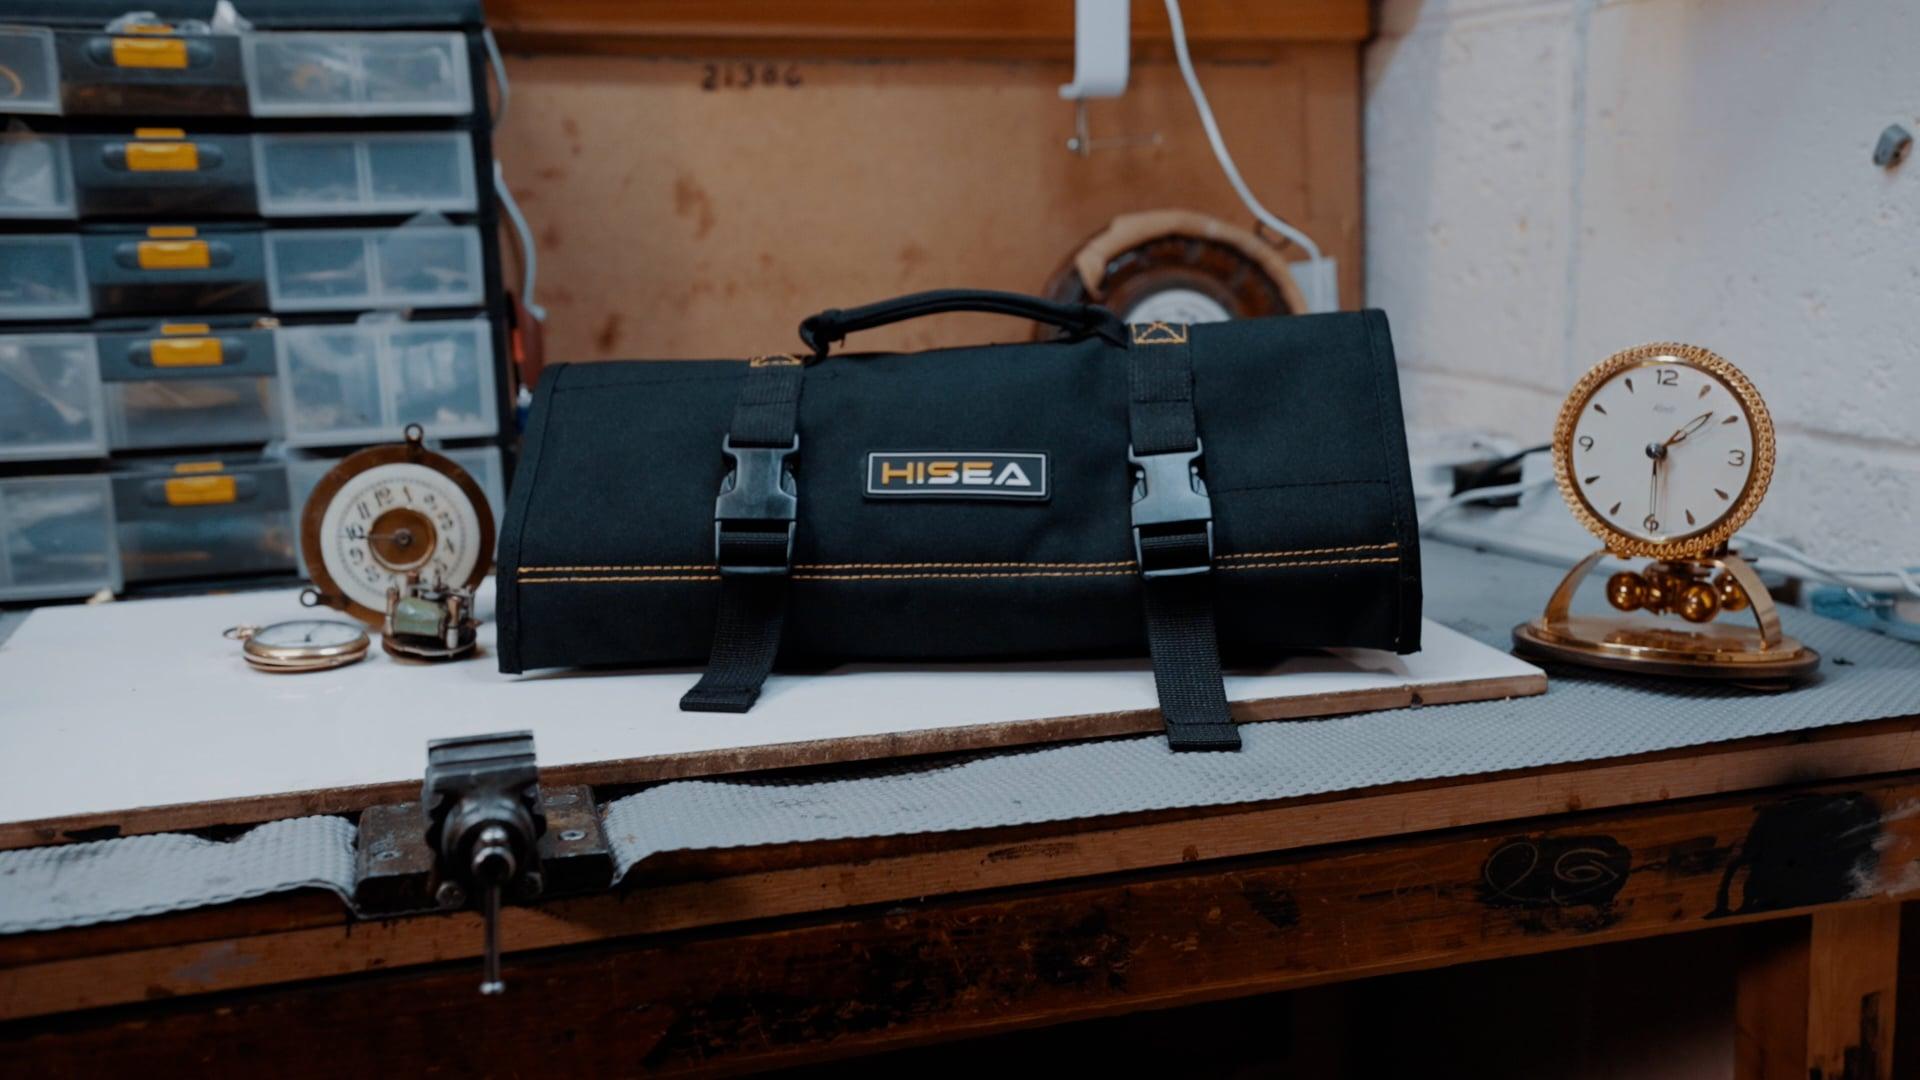 HiSea Tool Roll Bag - Product Video